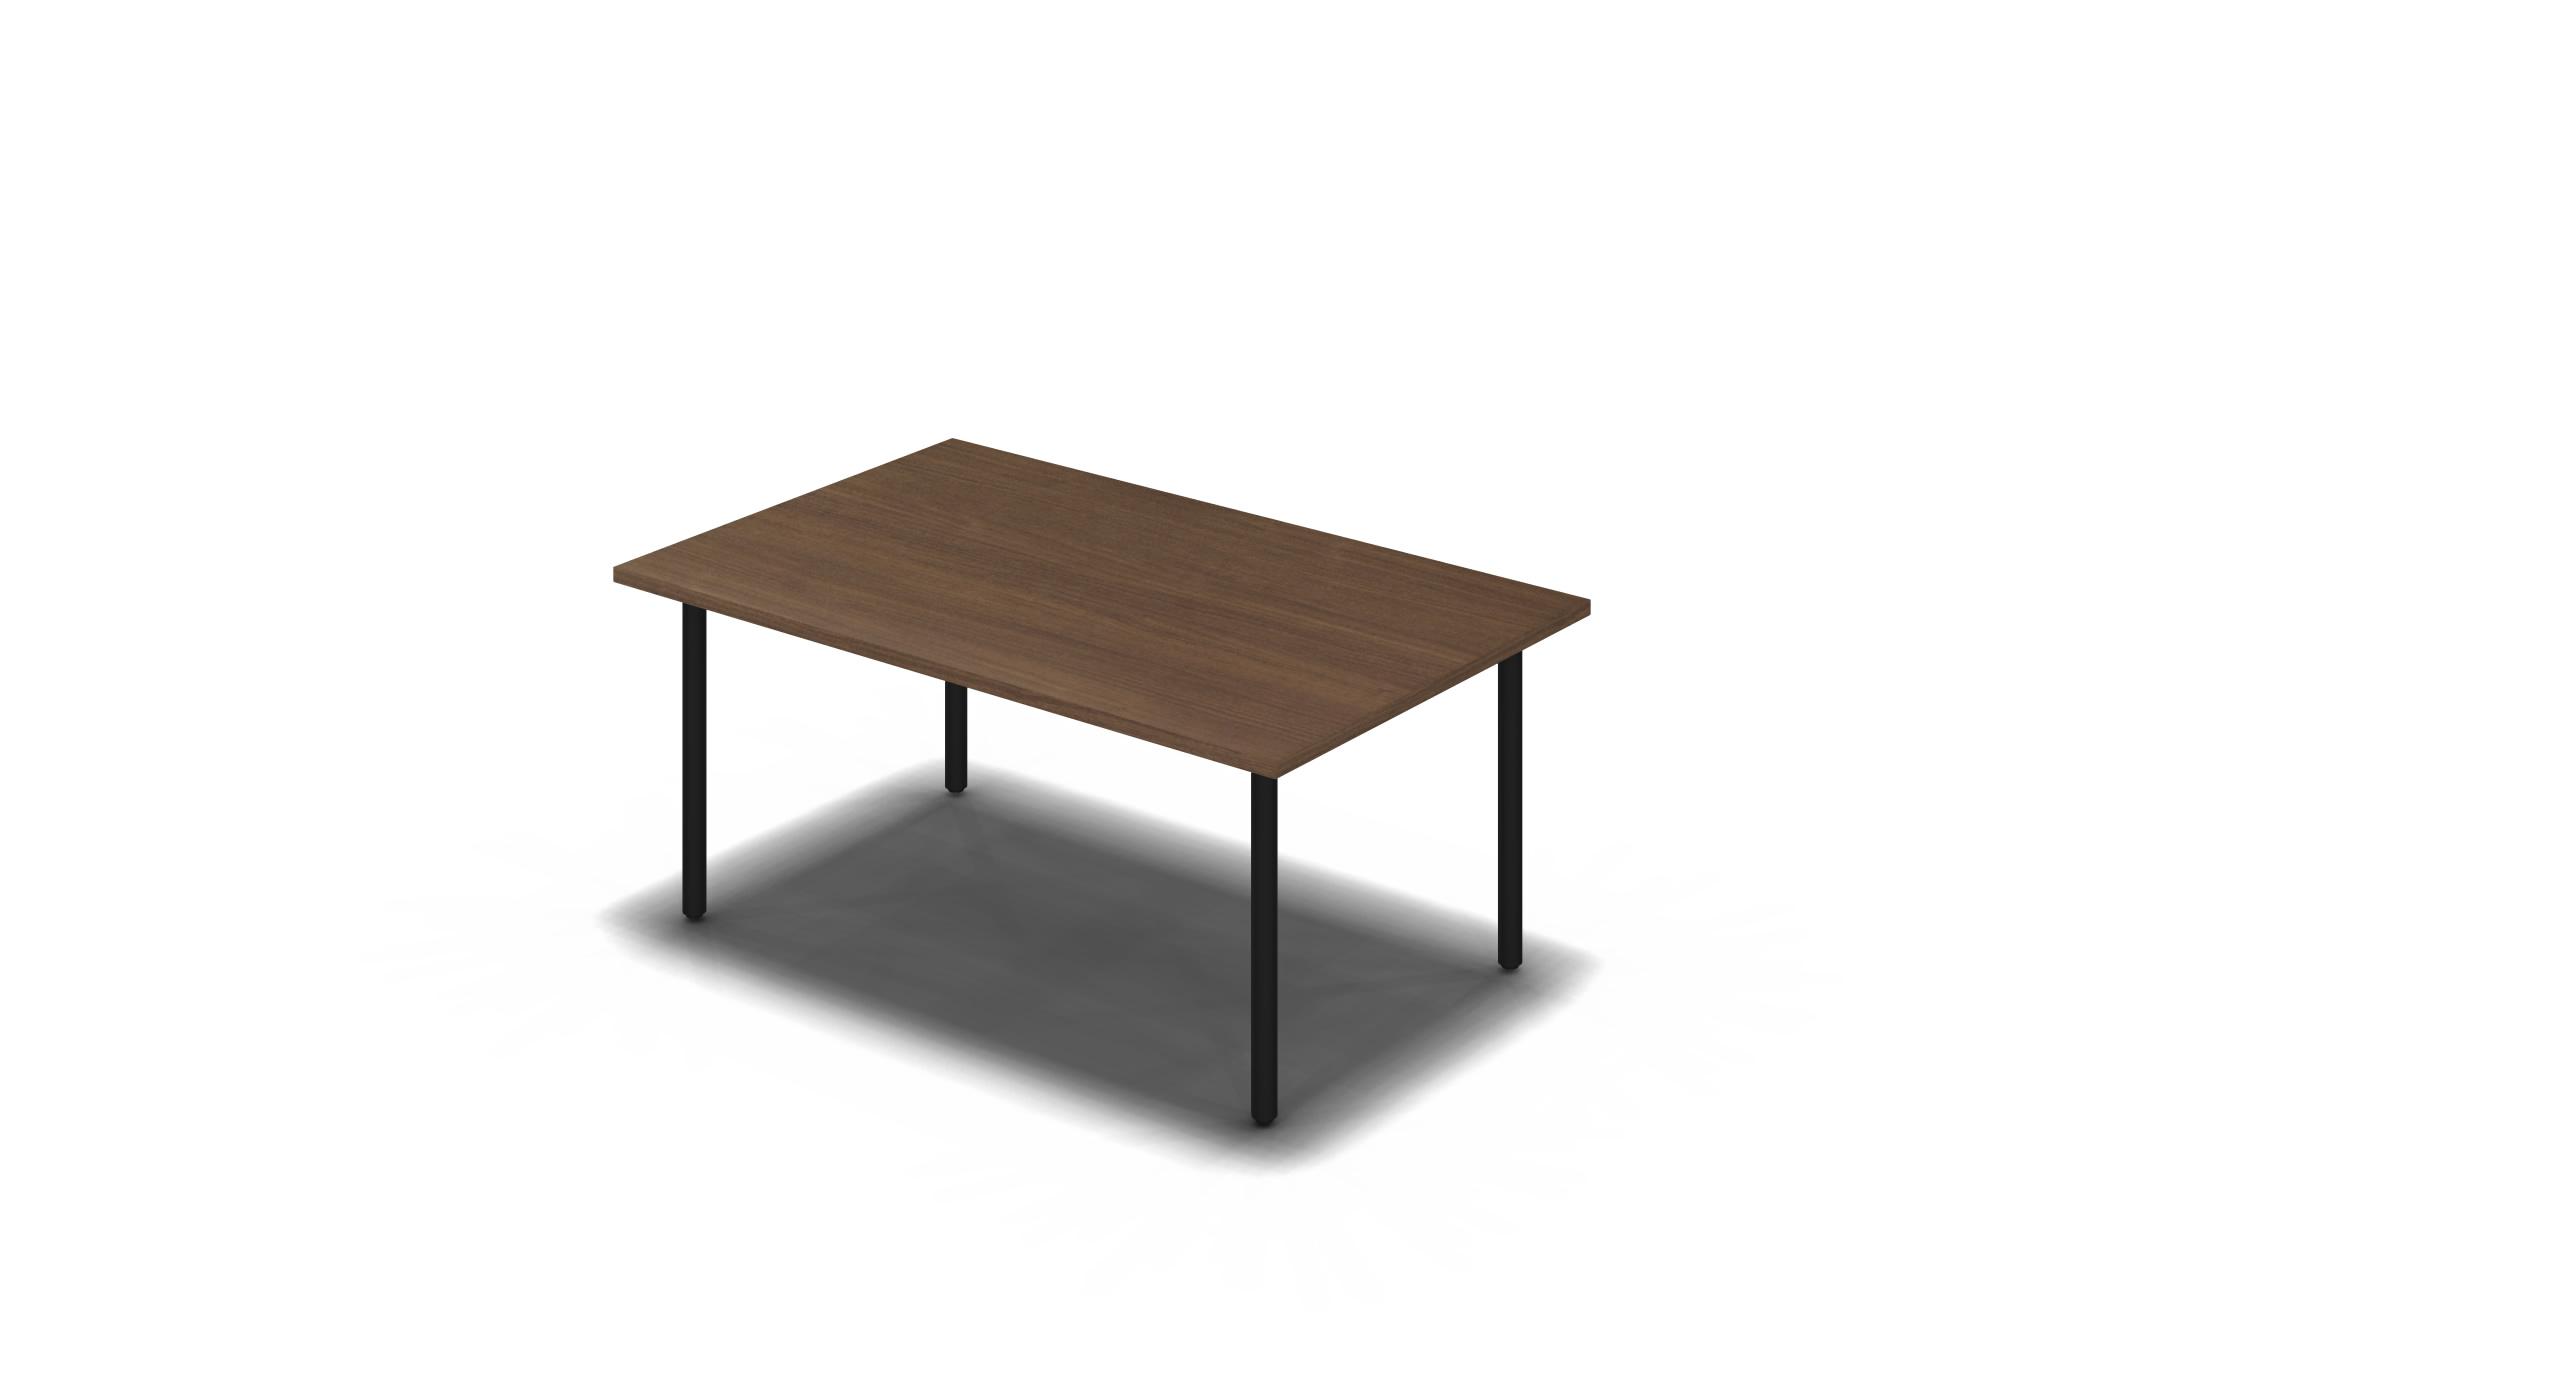 Table_Round_1500x900_Black_Walnut_noOption